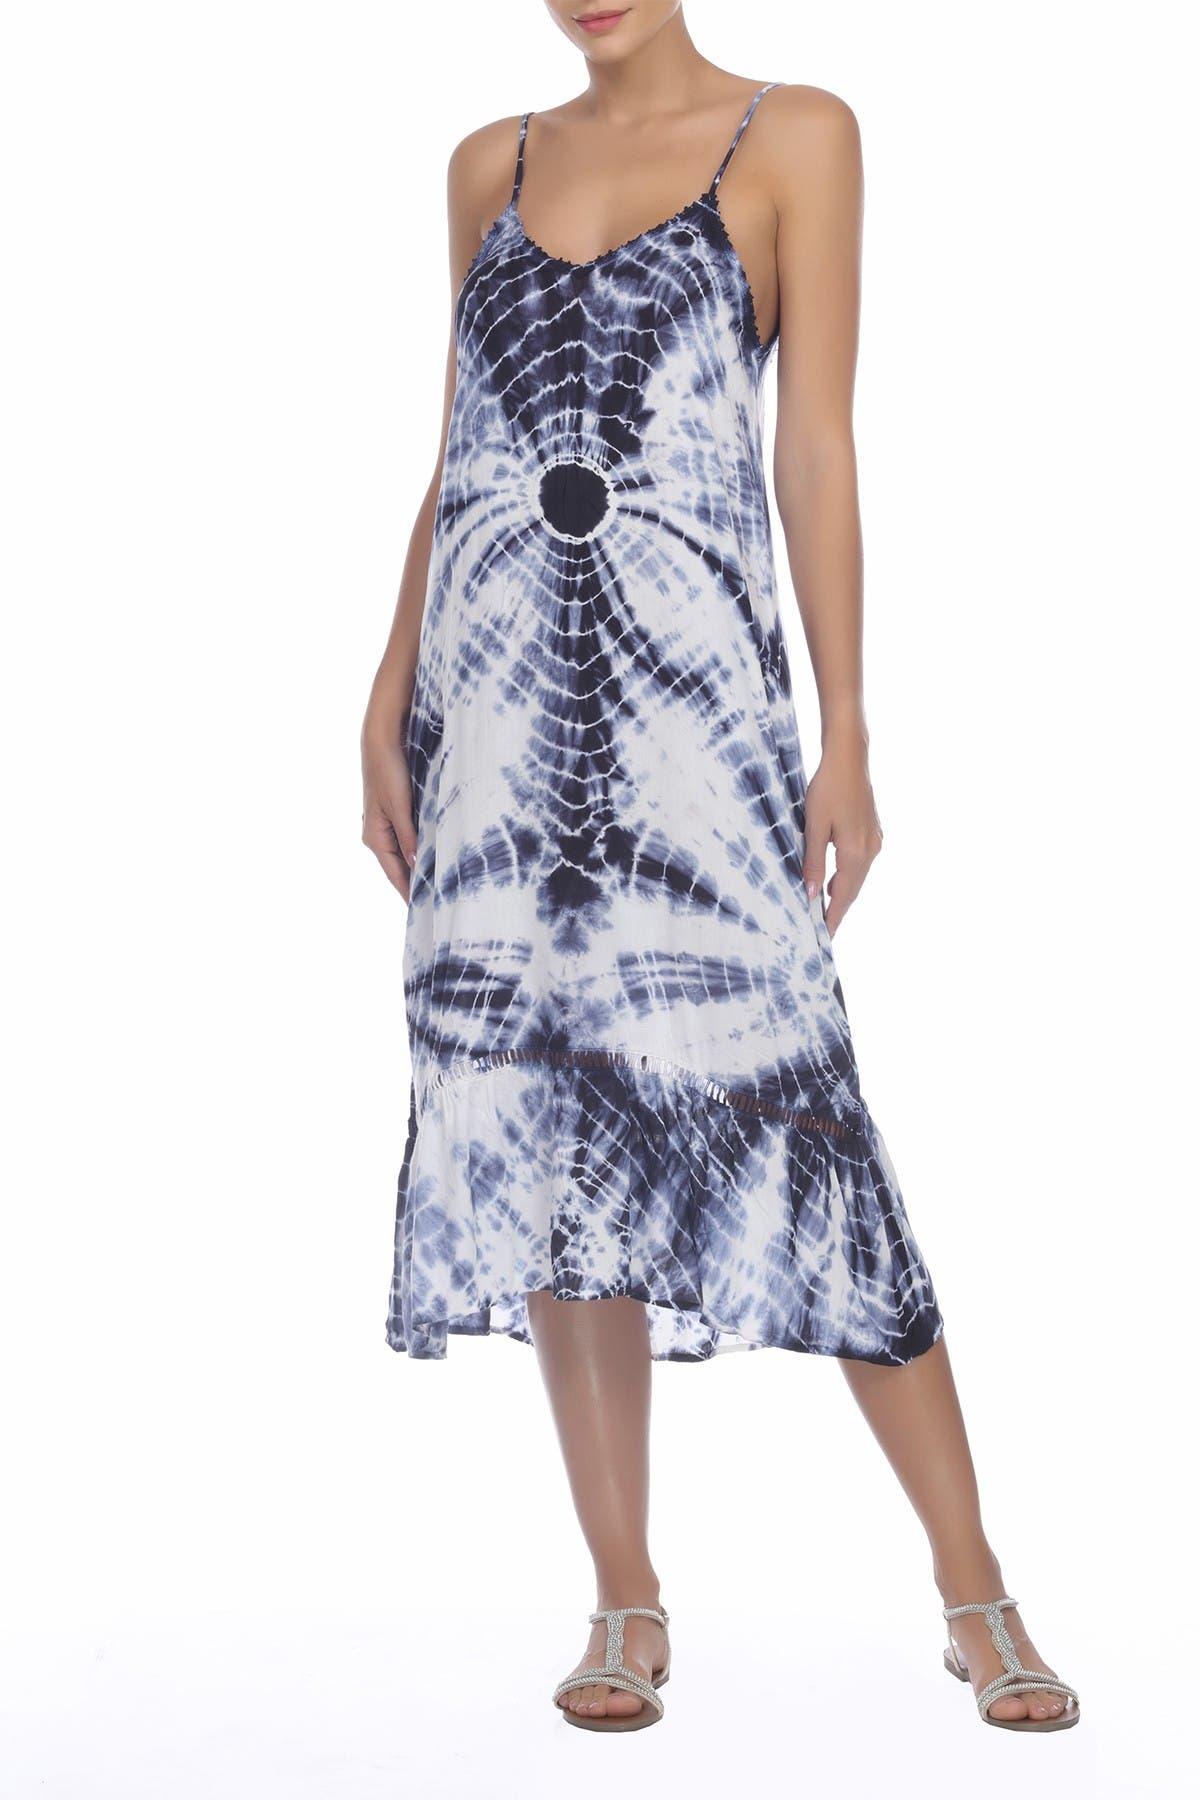 Image of BOHO ME Tie Dye Sleeveless Midi Dress